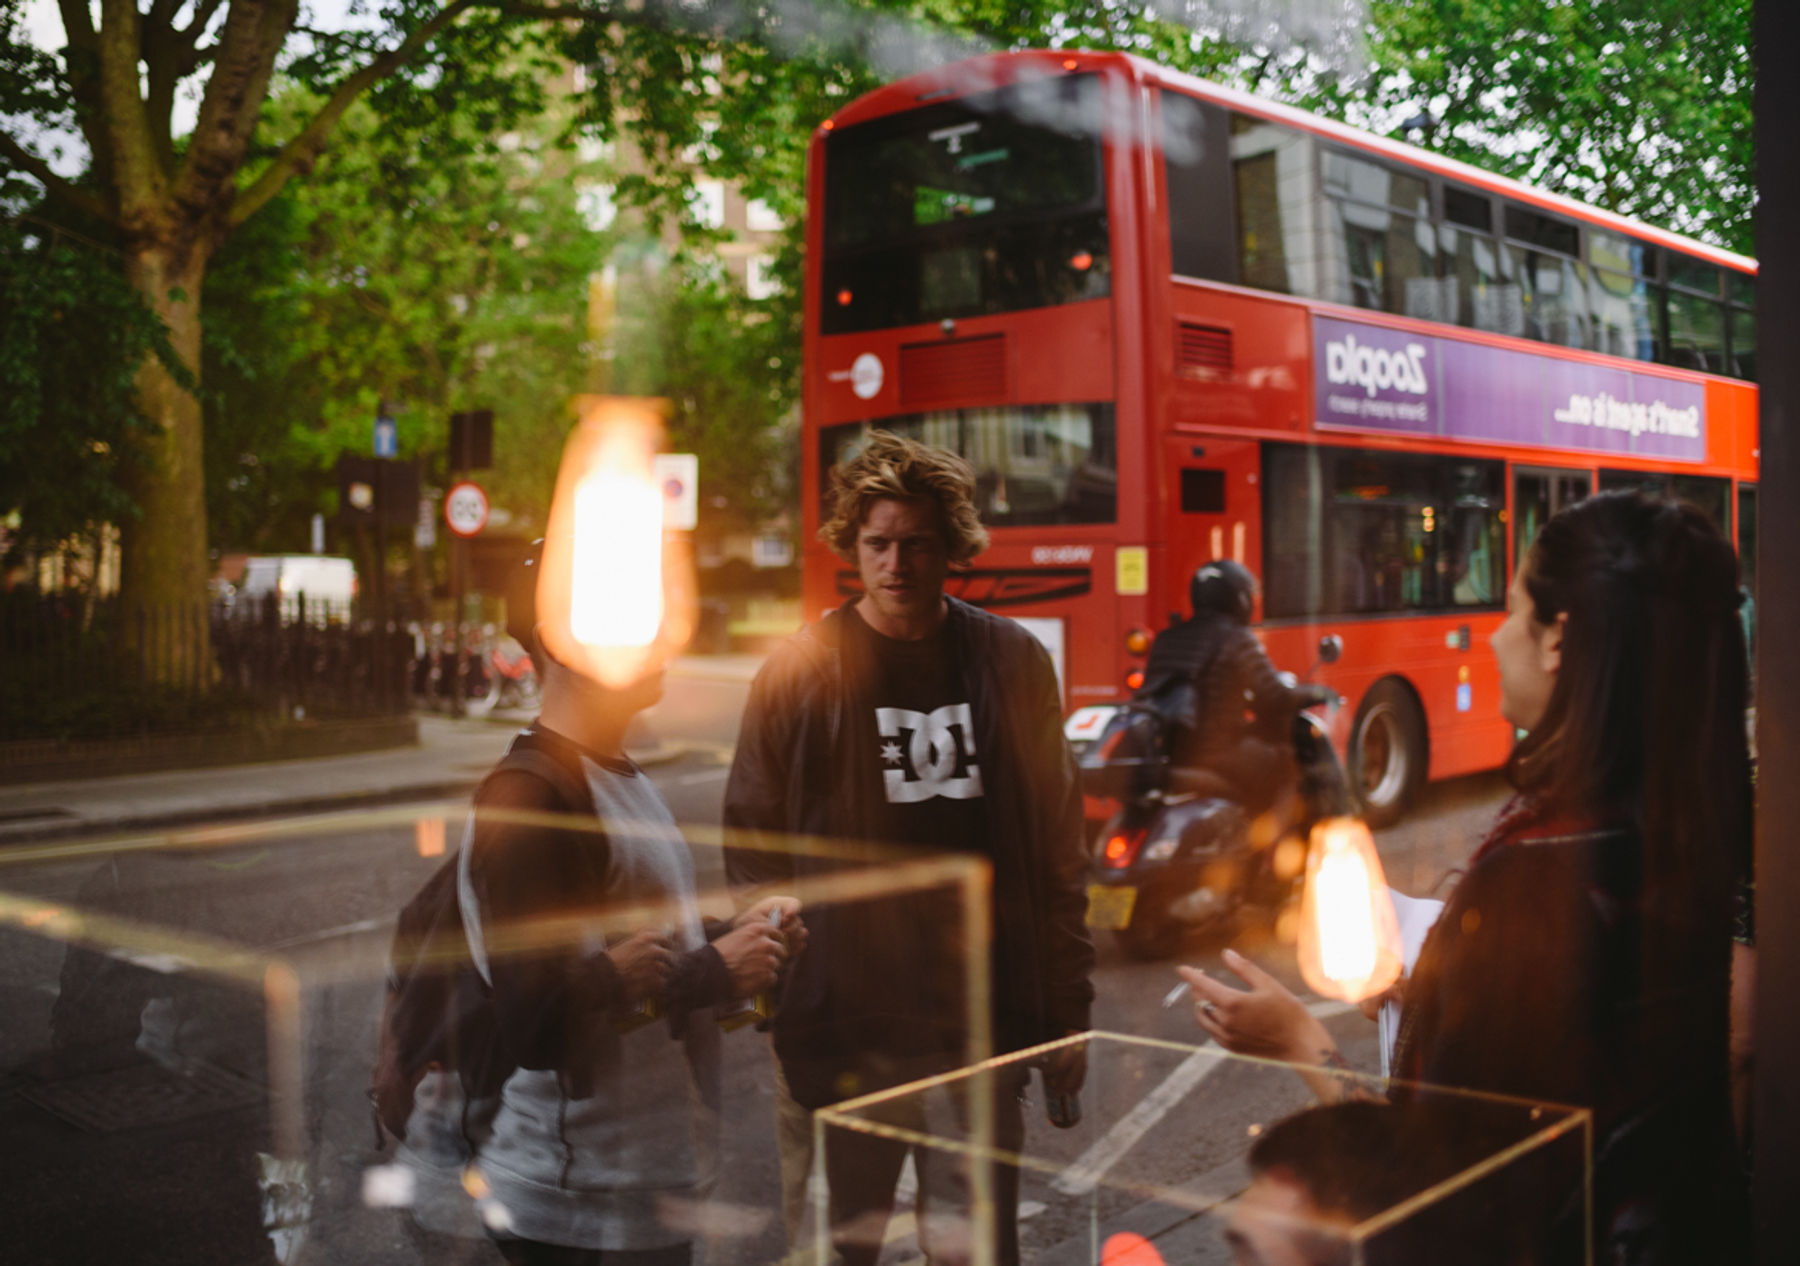 _IHC3825e-Wes-Kremer-DC-Special-Delivery-Skate-Tour-BTS-Parlour-Defy-Convention-Exhibition-London-May-2015-Photographer-Maksim-Kalanep